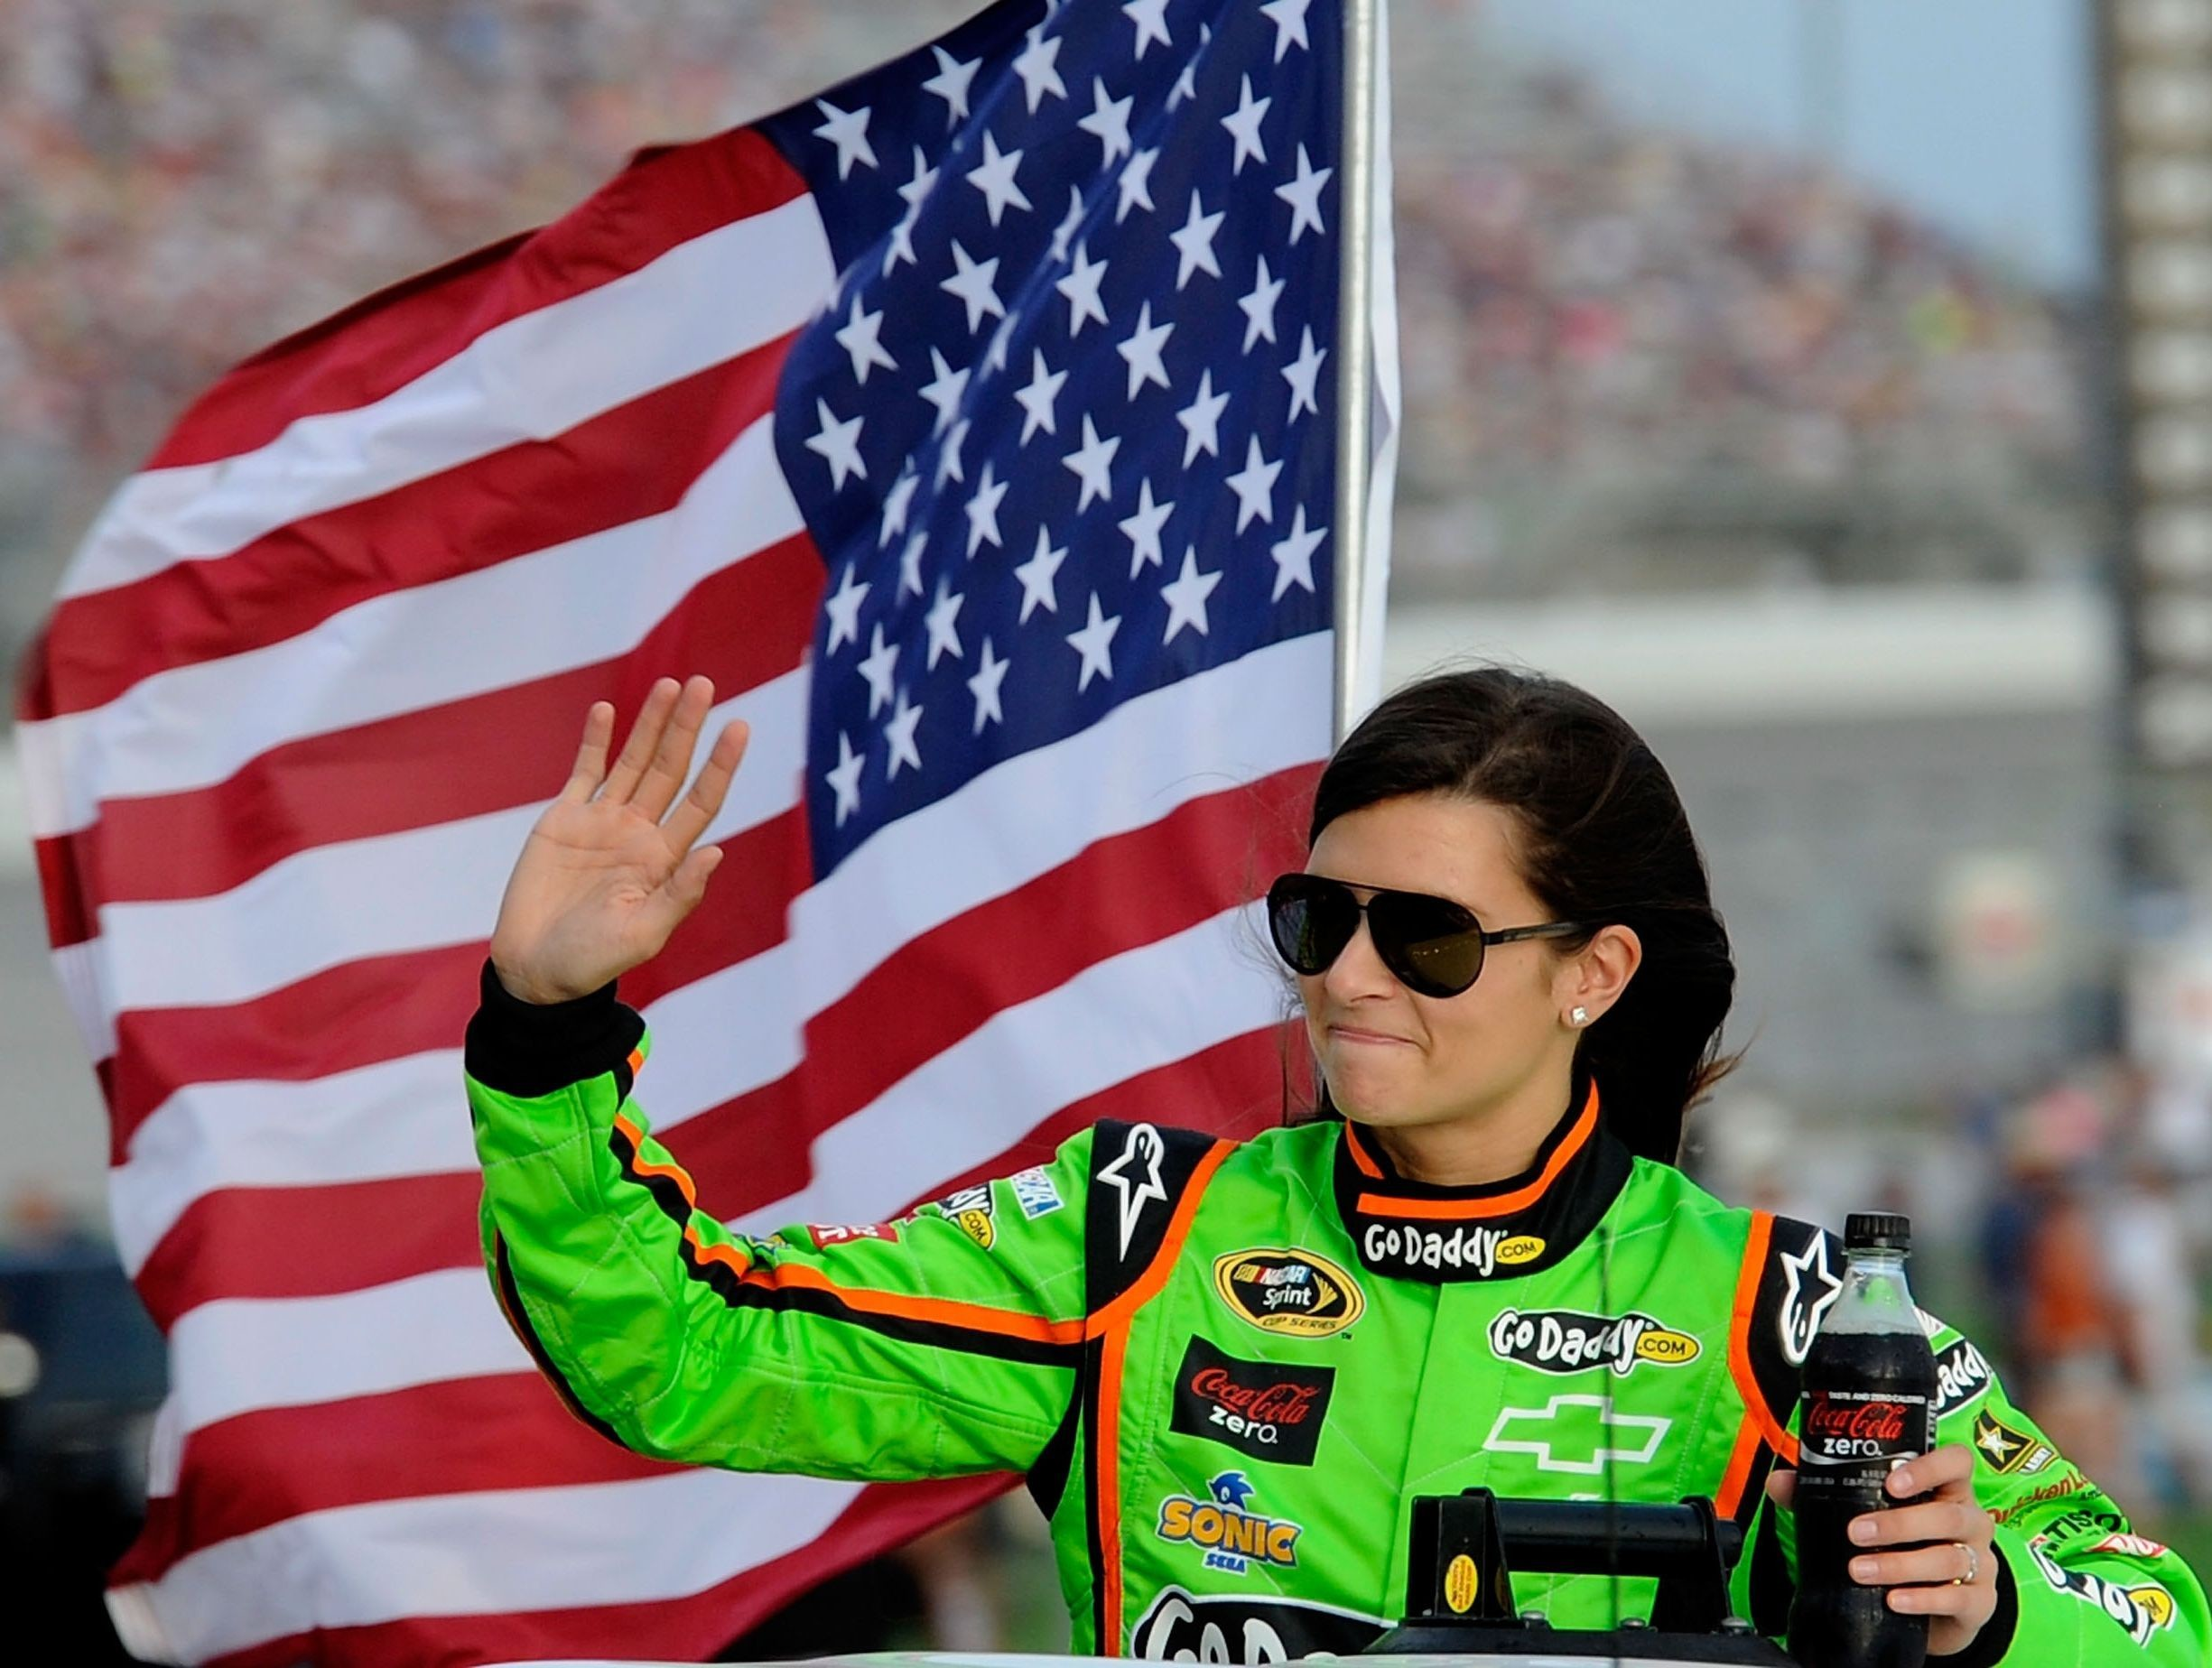 Action Racing Collectibles #Danica Patrick 12 Nationwide #NASCAR .